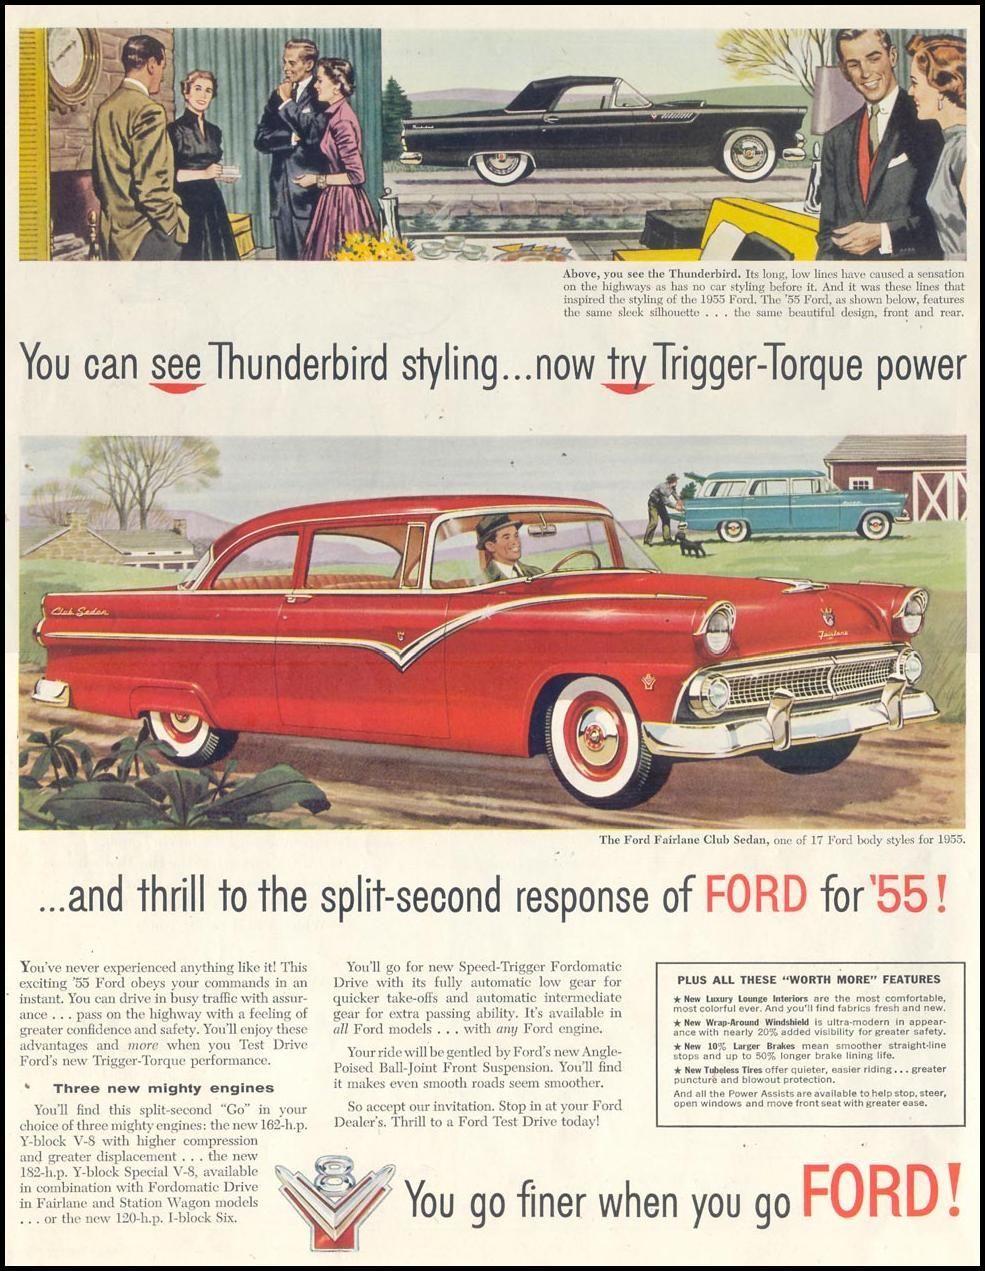 1955 Ford Fairlane Club Sedan Fordclassiccars Ford Fairlane